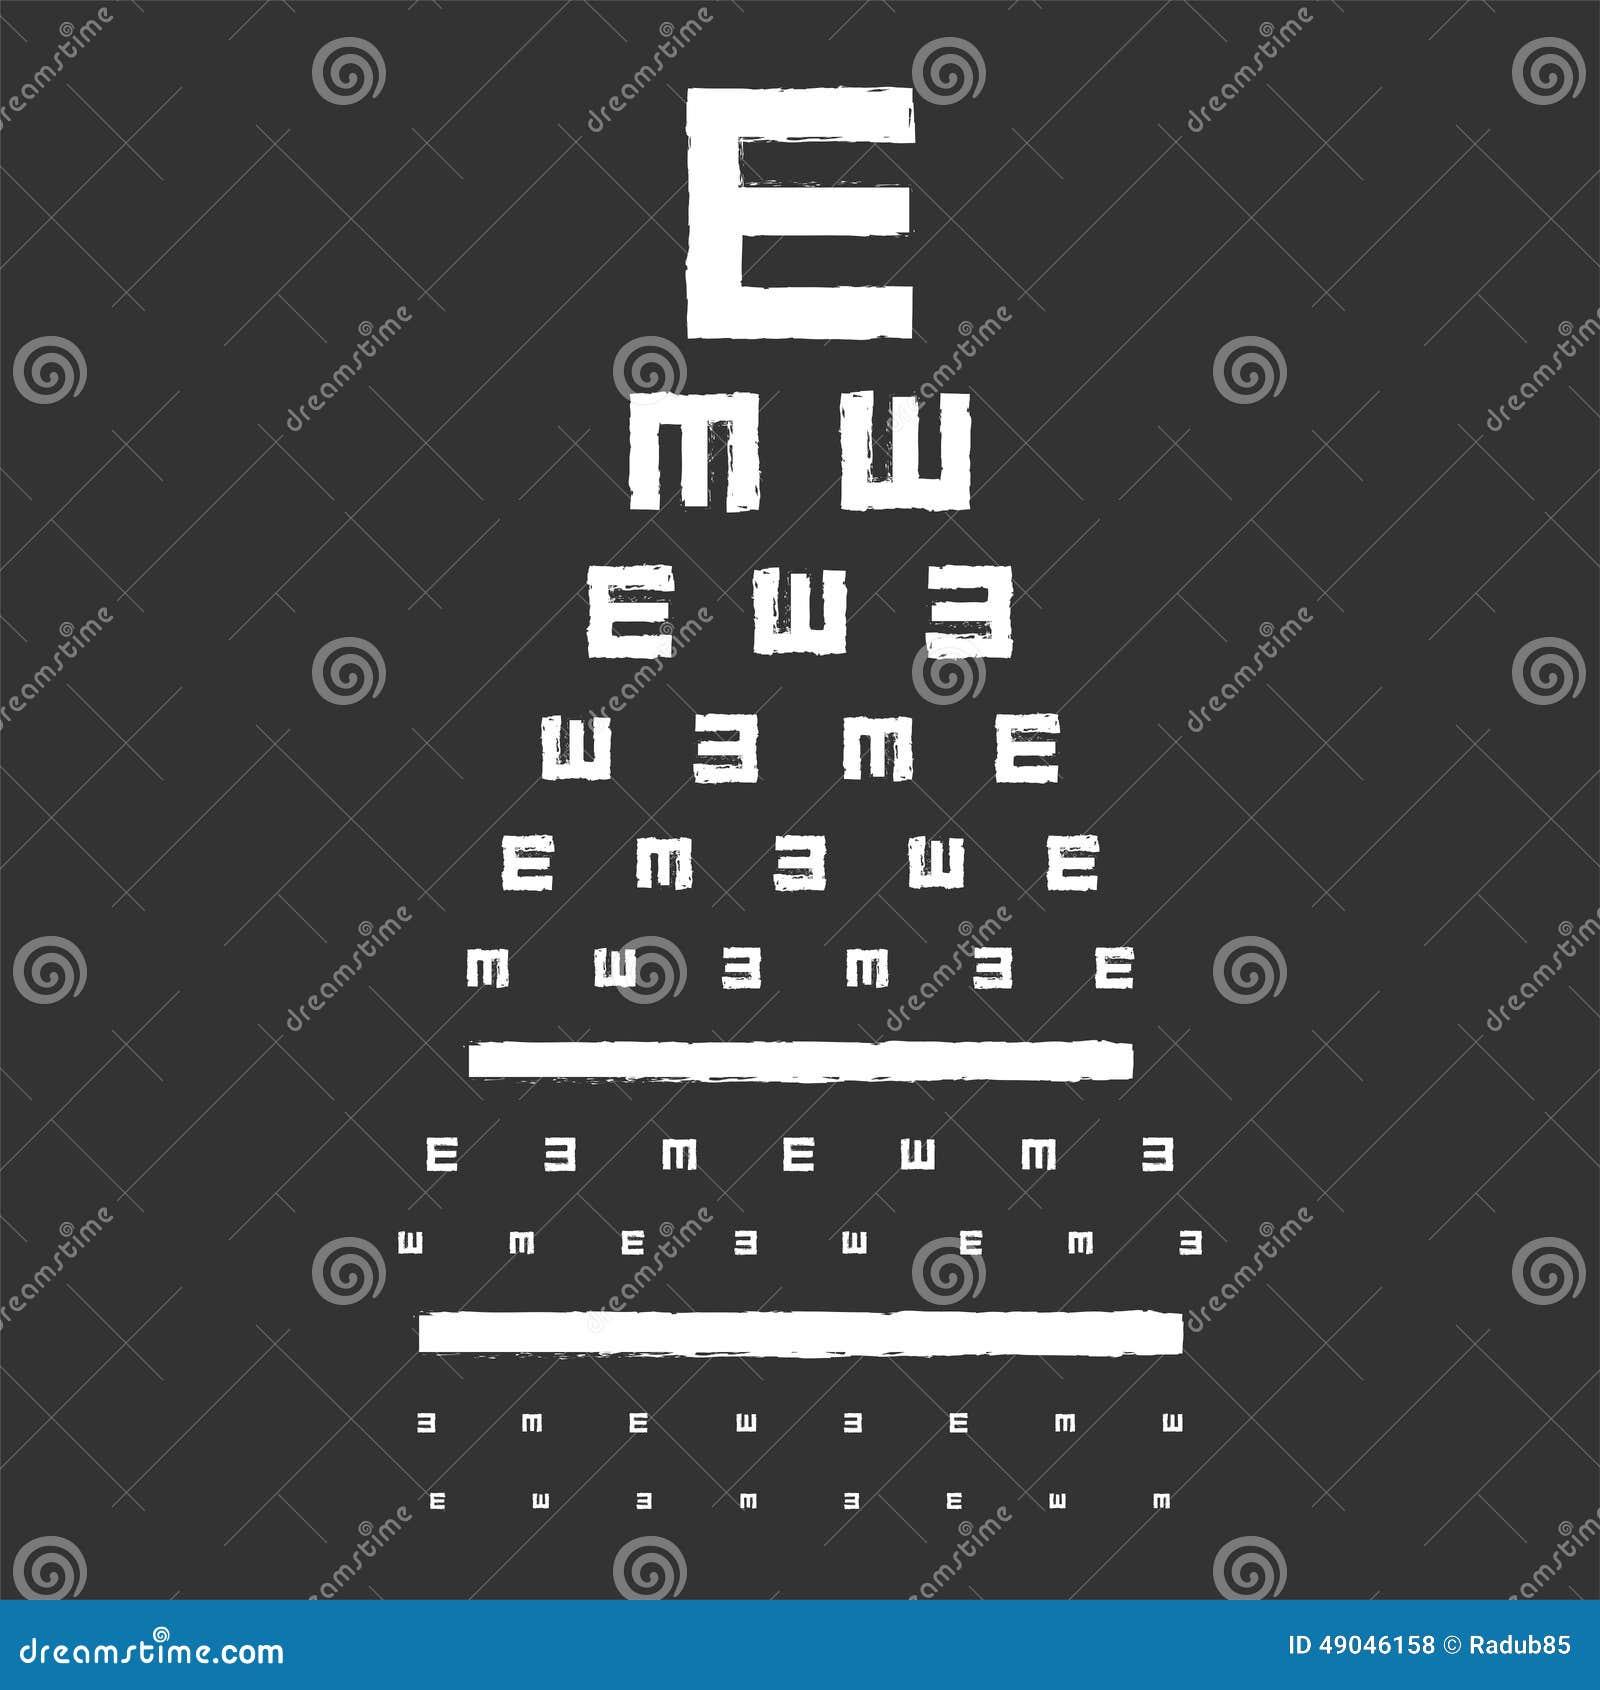 Eye Sight Test Chart Stock Vector Illustration Of Medication 49046158